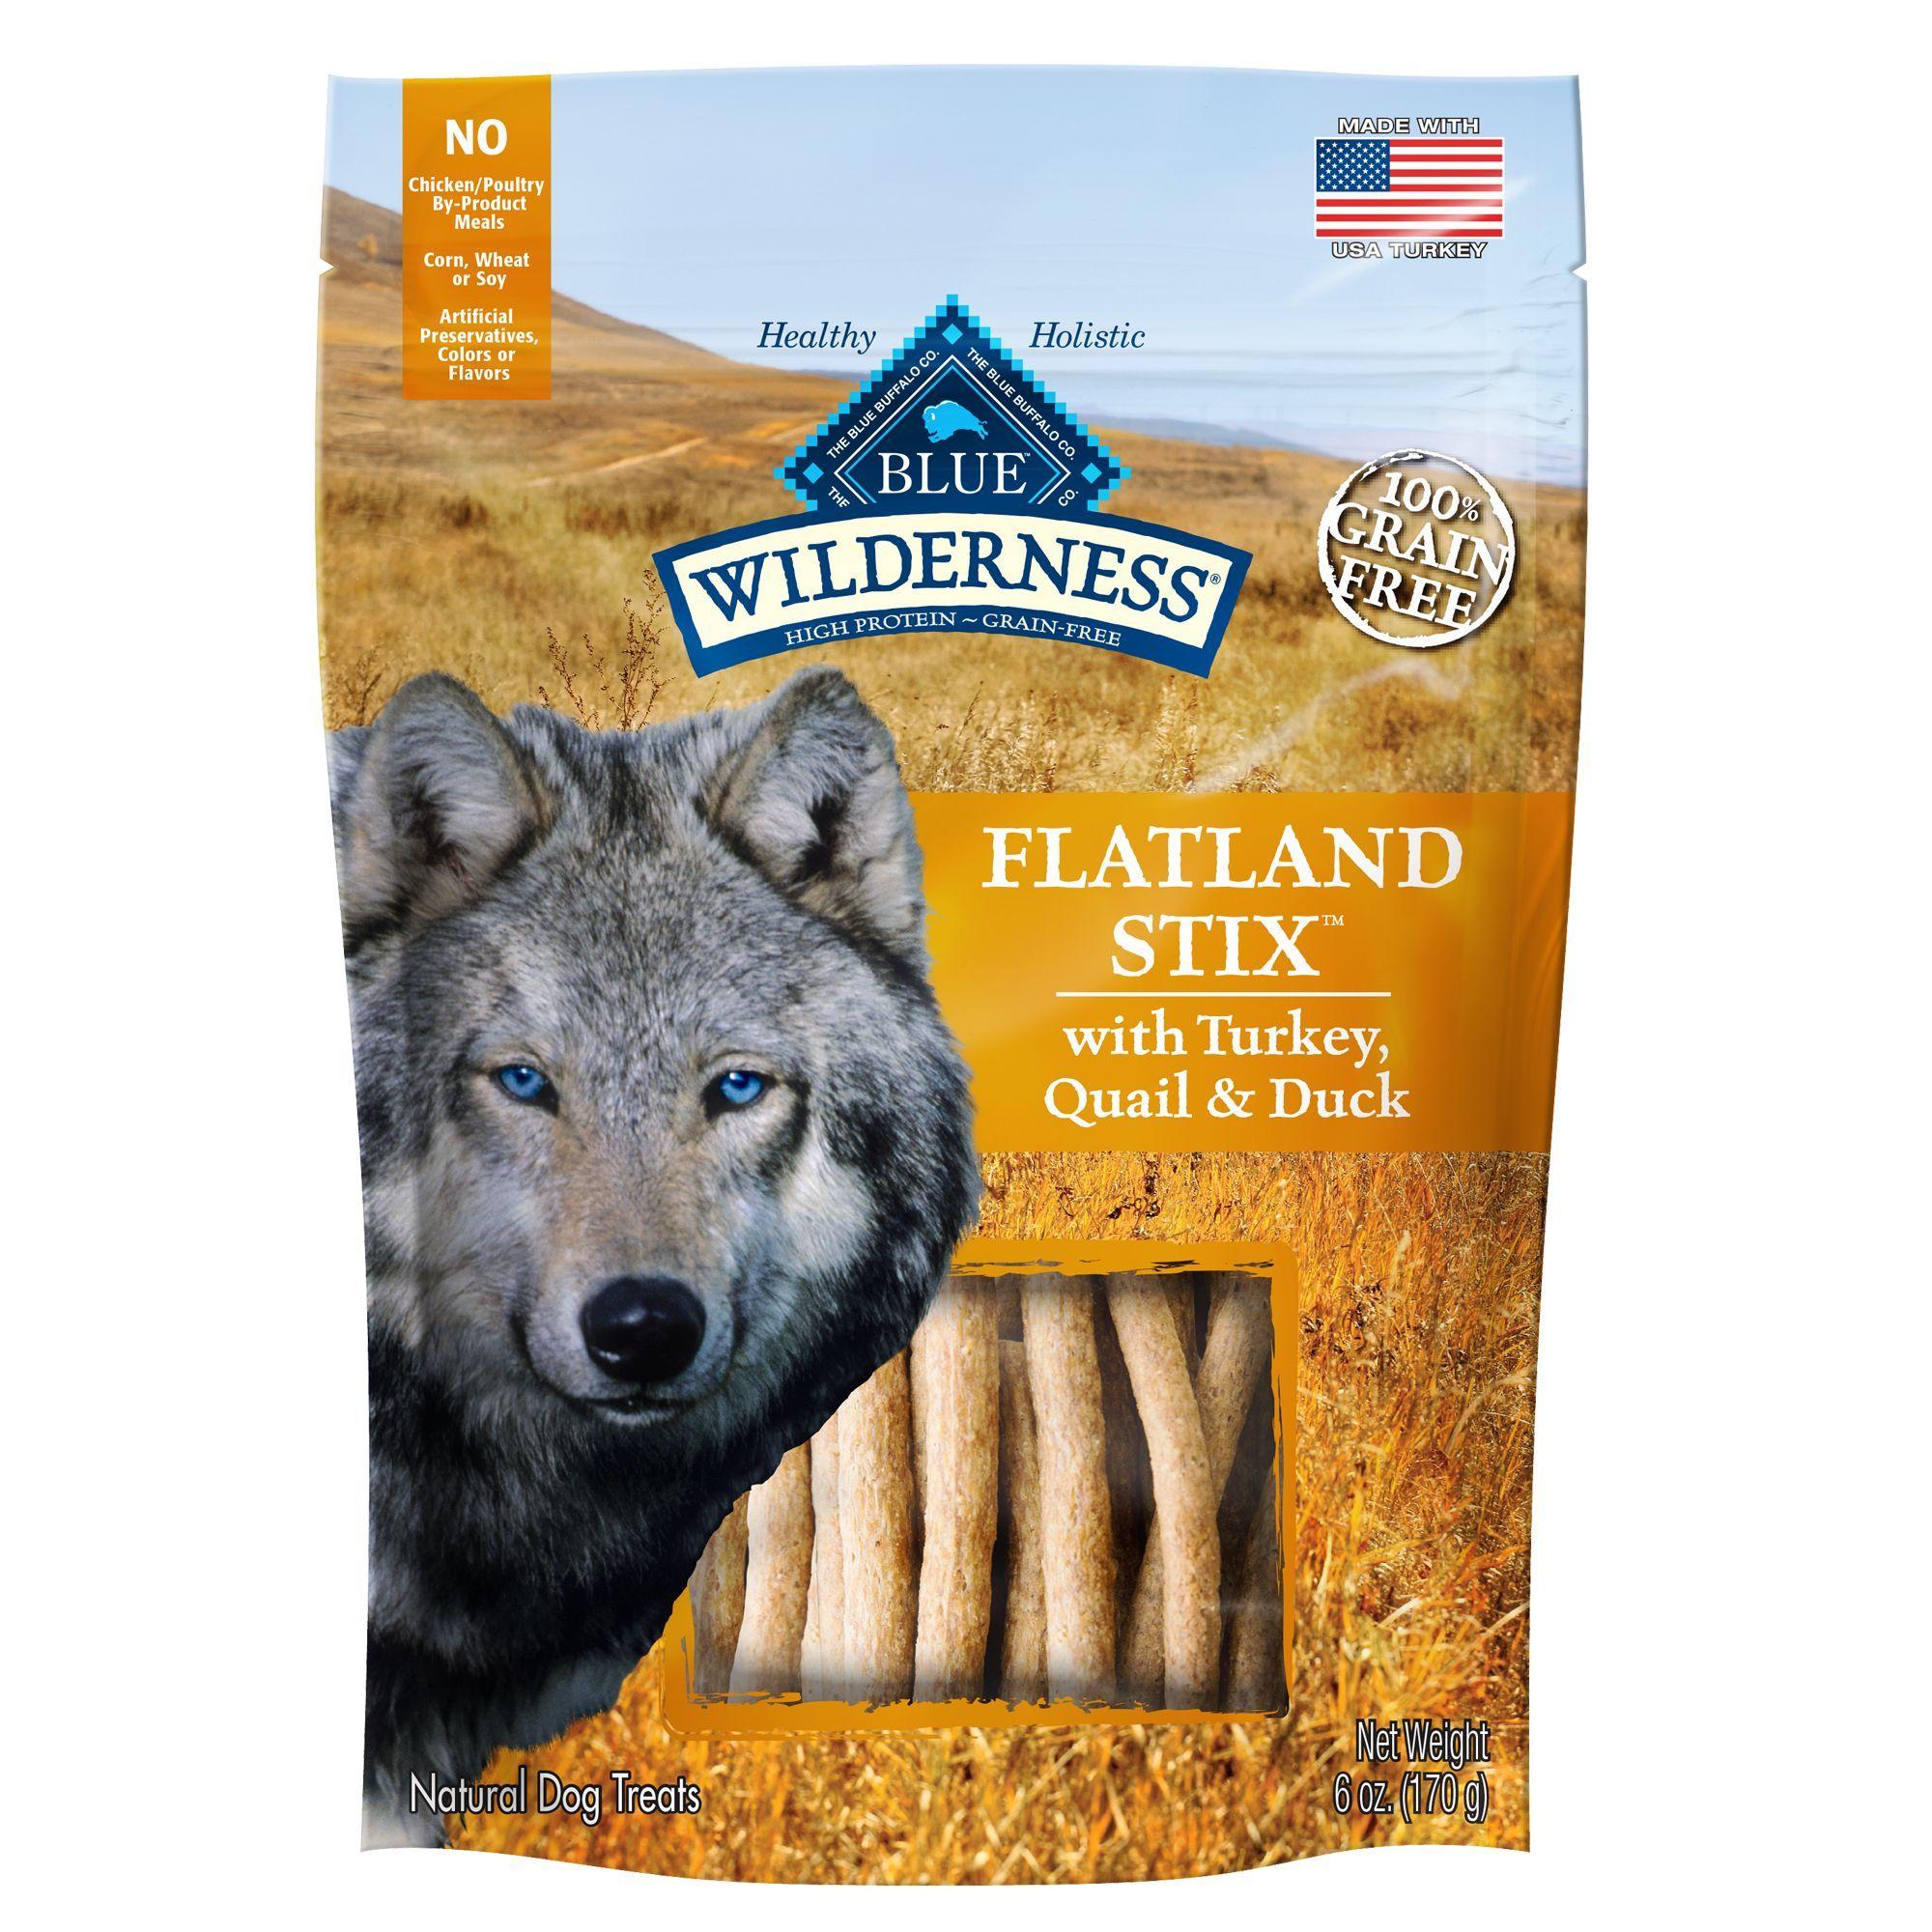 Blue Buffalo Wilderness Flatland Stix Dog Treats Natural Grain Free Turkey Quail Duck Natural Dog Treats Dog Treats Dog Treats Grain Free